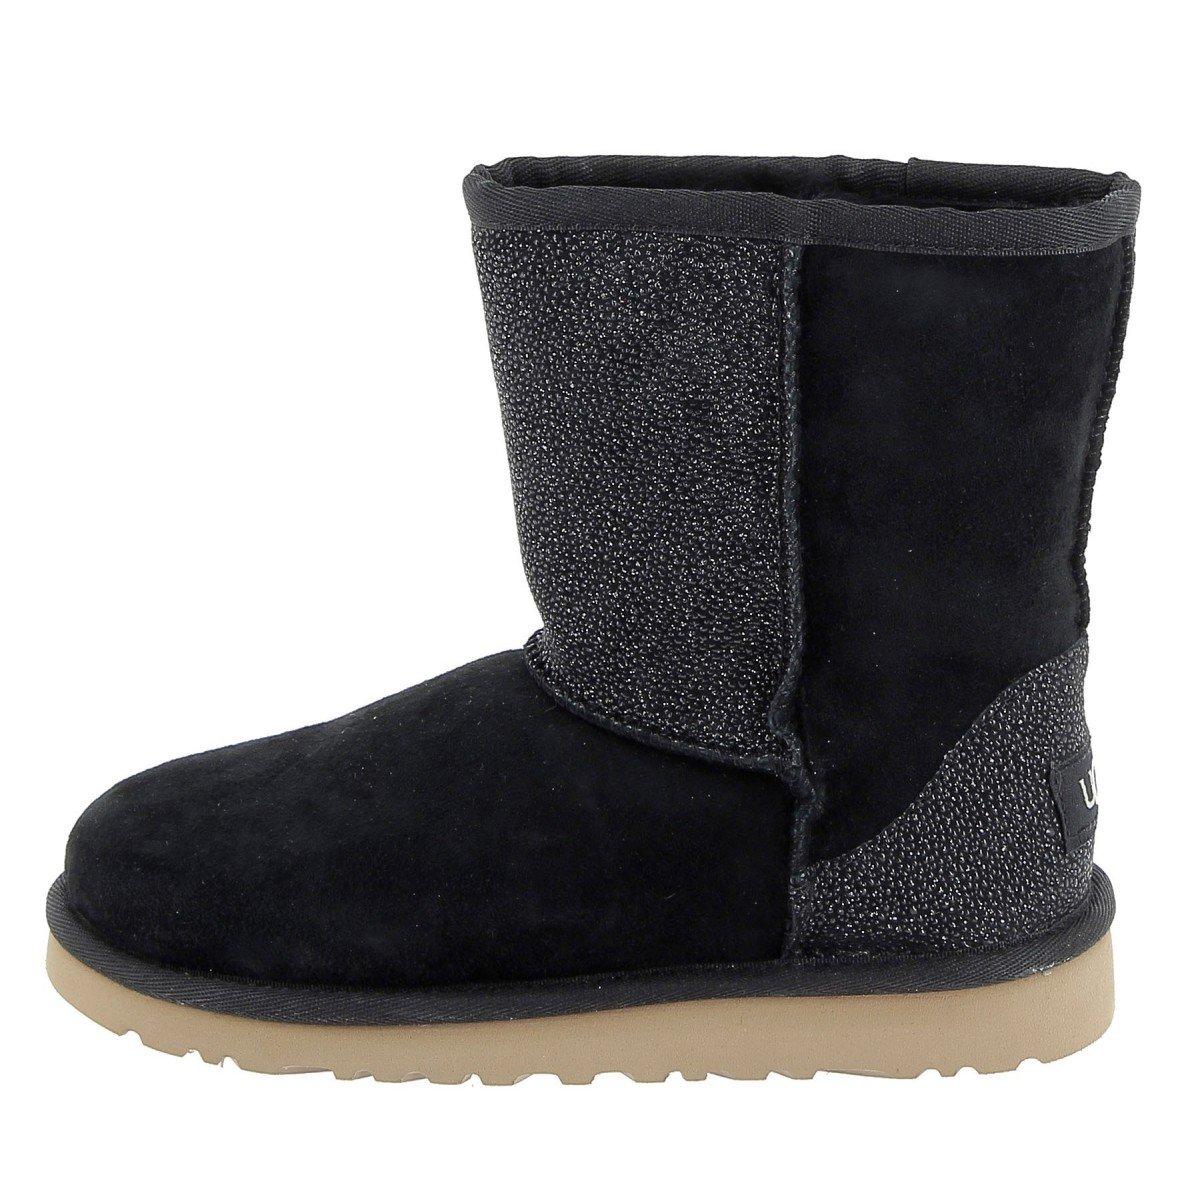 UGG Kids Classic Short Serein Boot Black Size 3 M US Little Kid